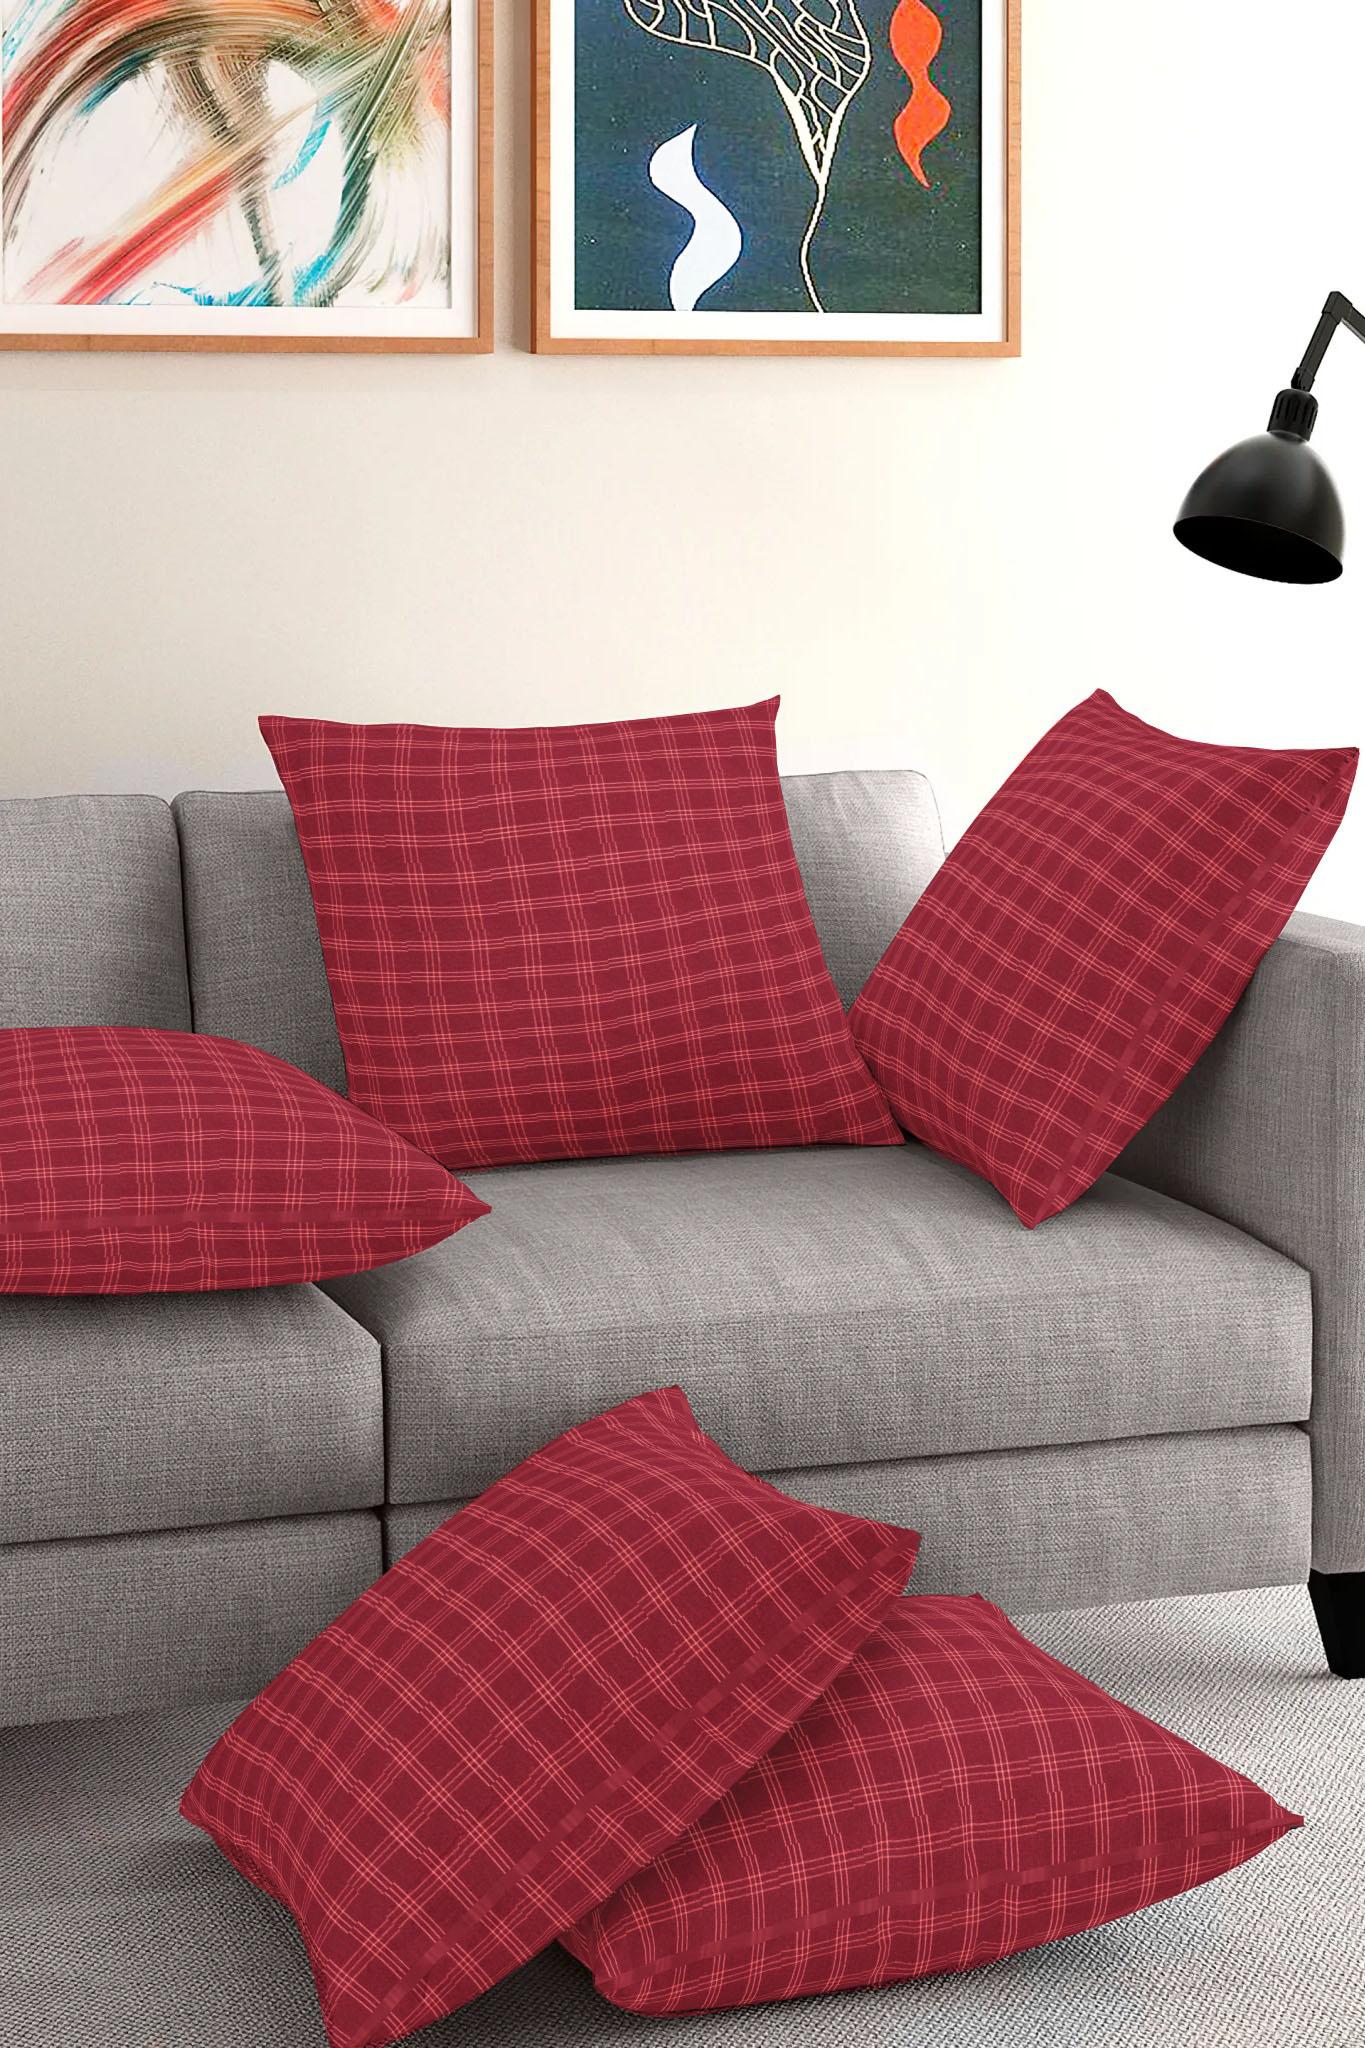 /home/customer/www/fabartcraft.com/public_html/uploadshttps://www.shopolics.com/uploads/images/medium/Maroon-White-Cotton-Cushion-Cover-35381.jpg